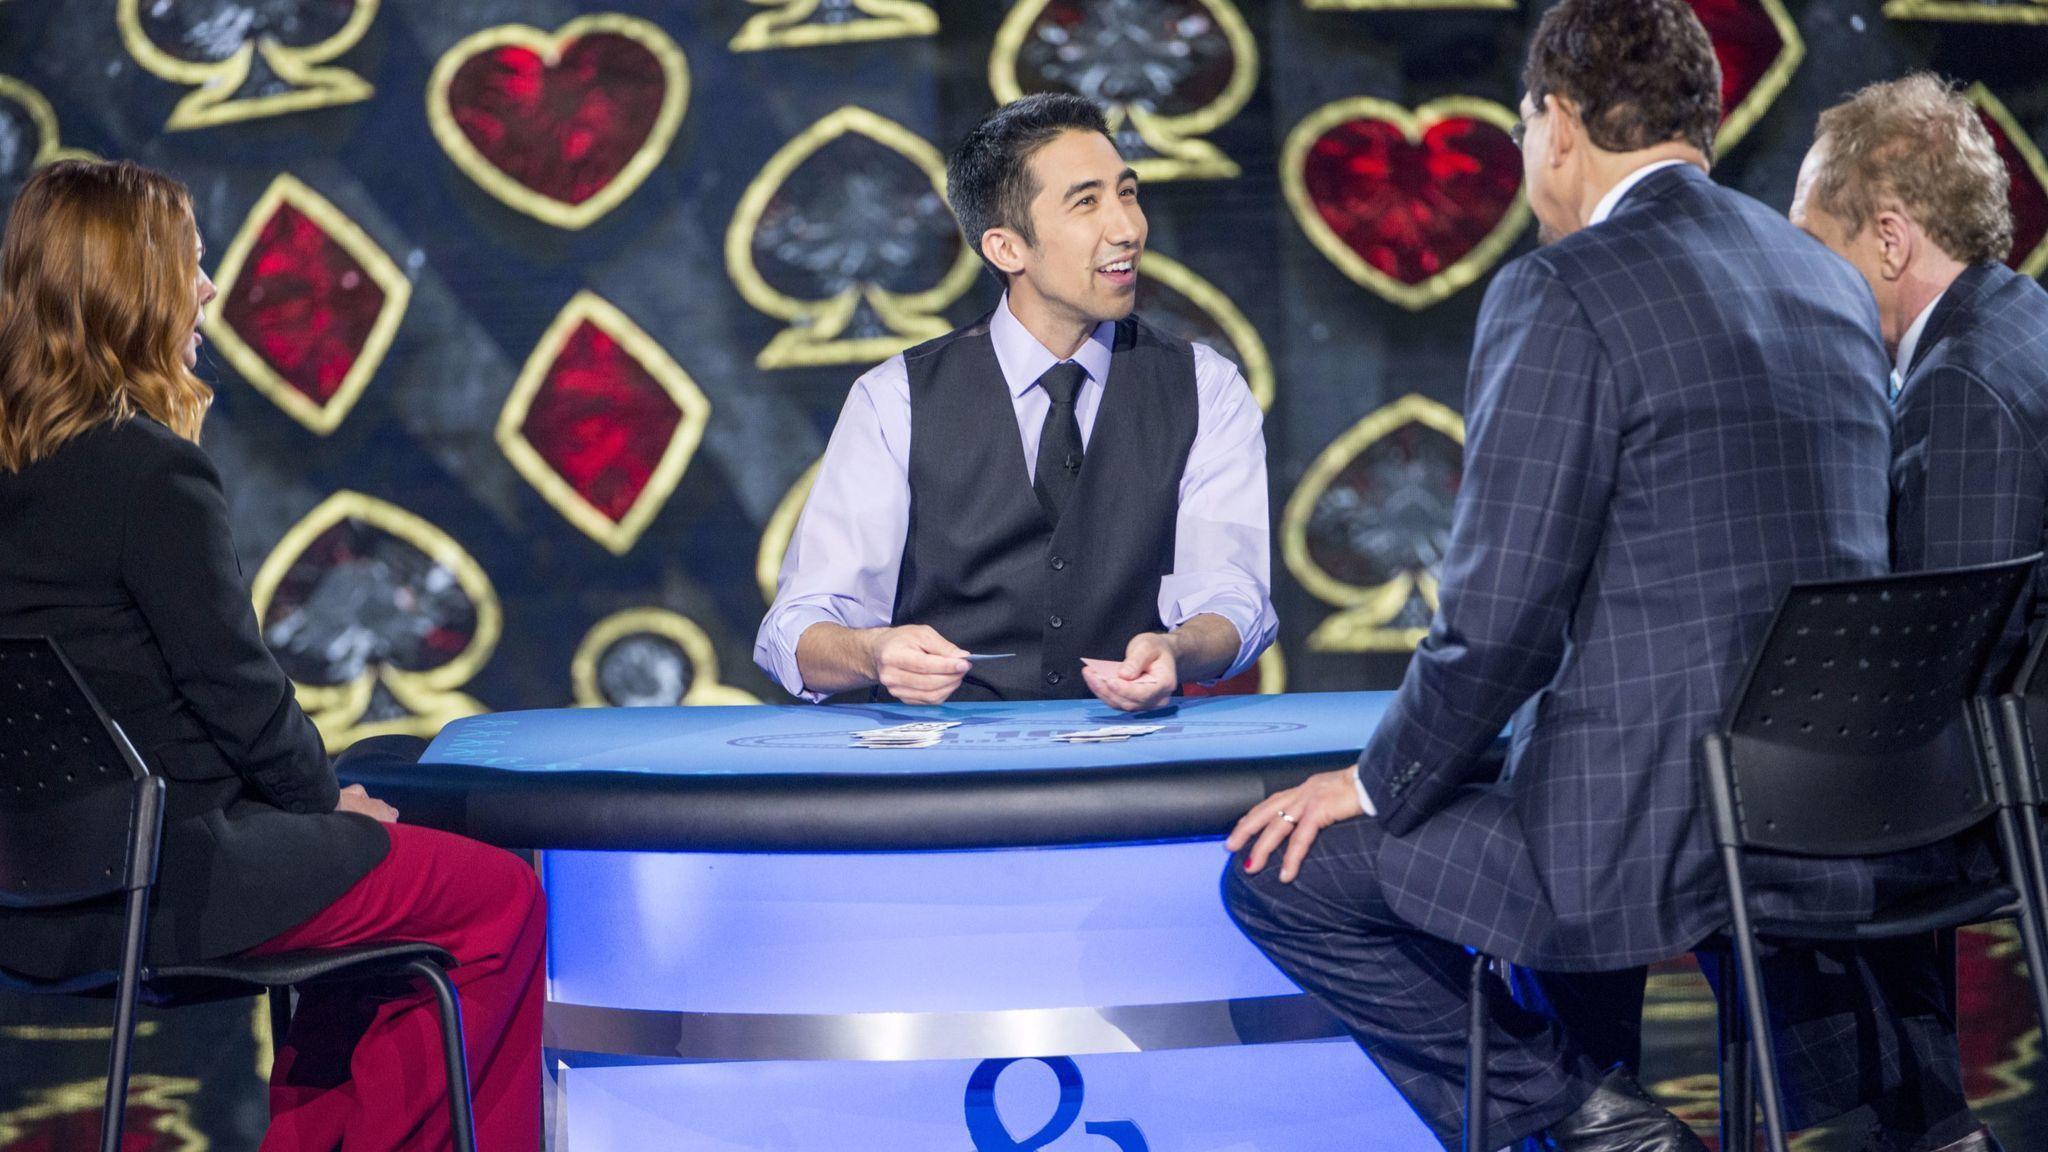 'Penn & Teller: Fool Us' features Orlando magician ...